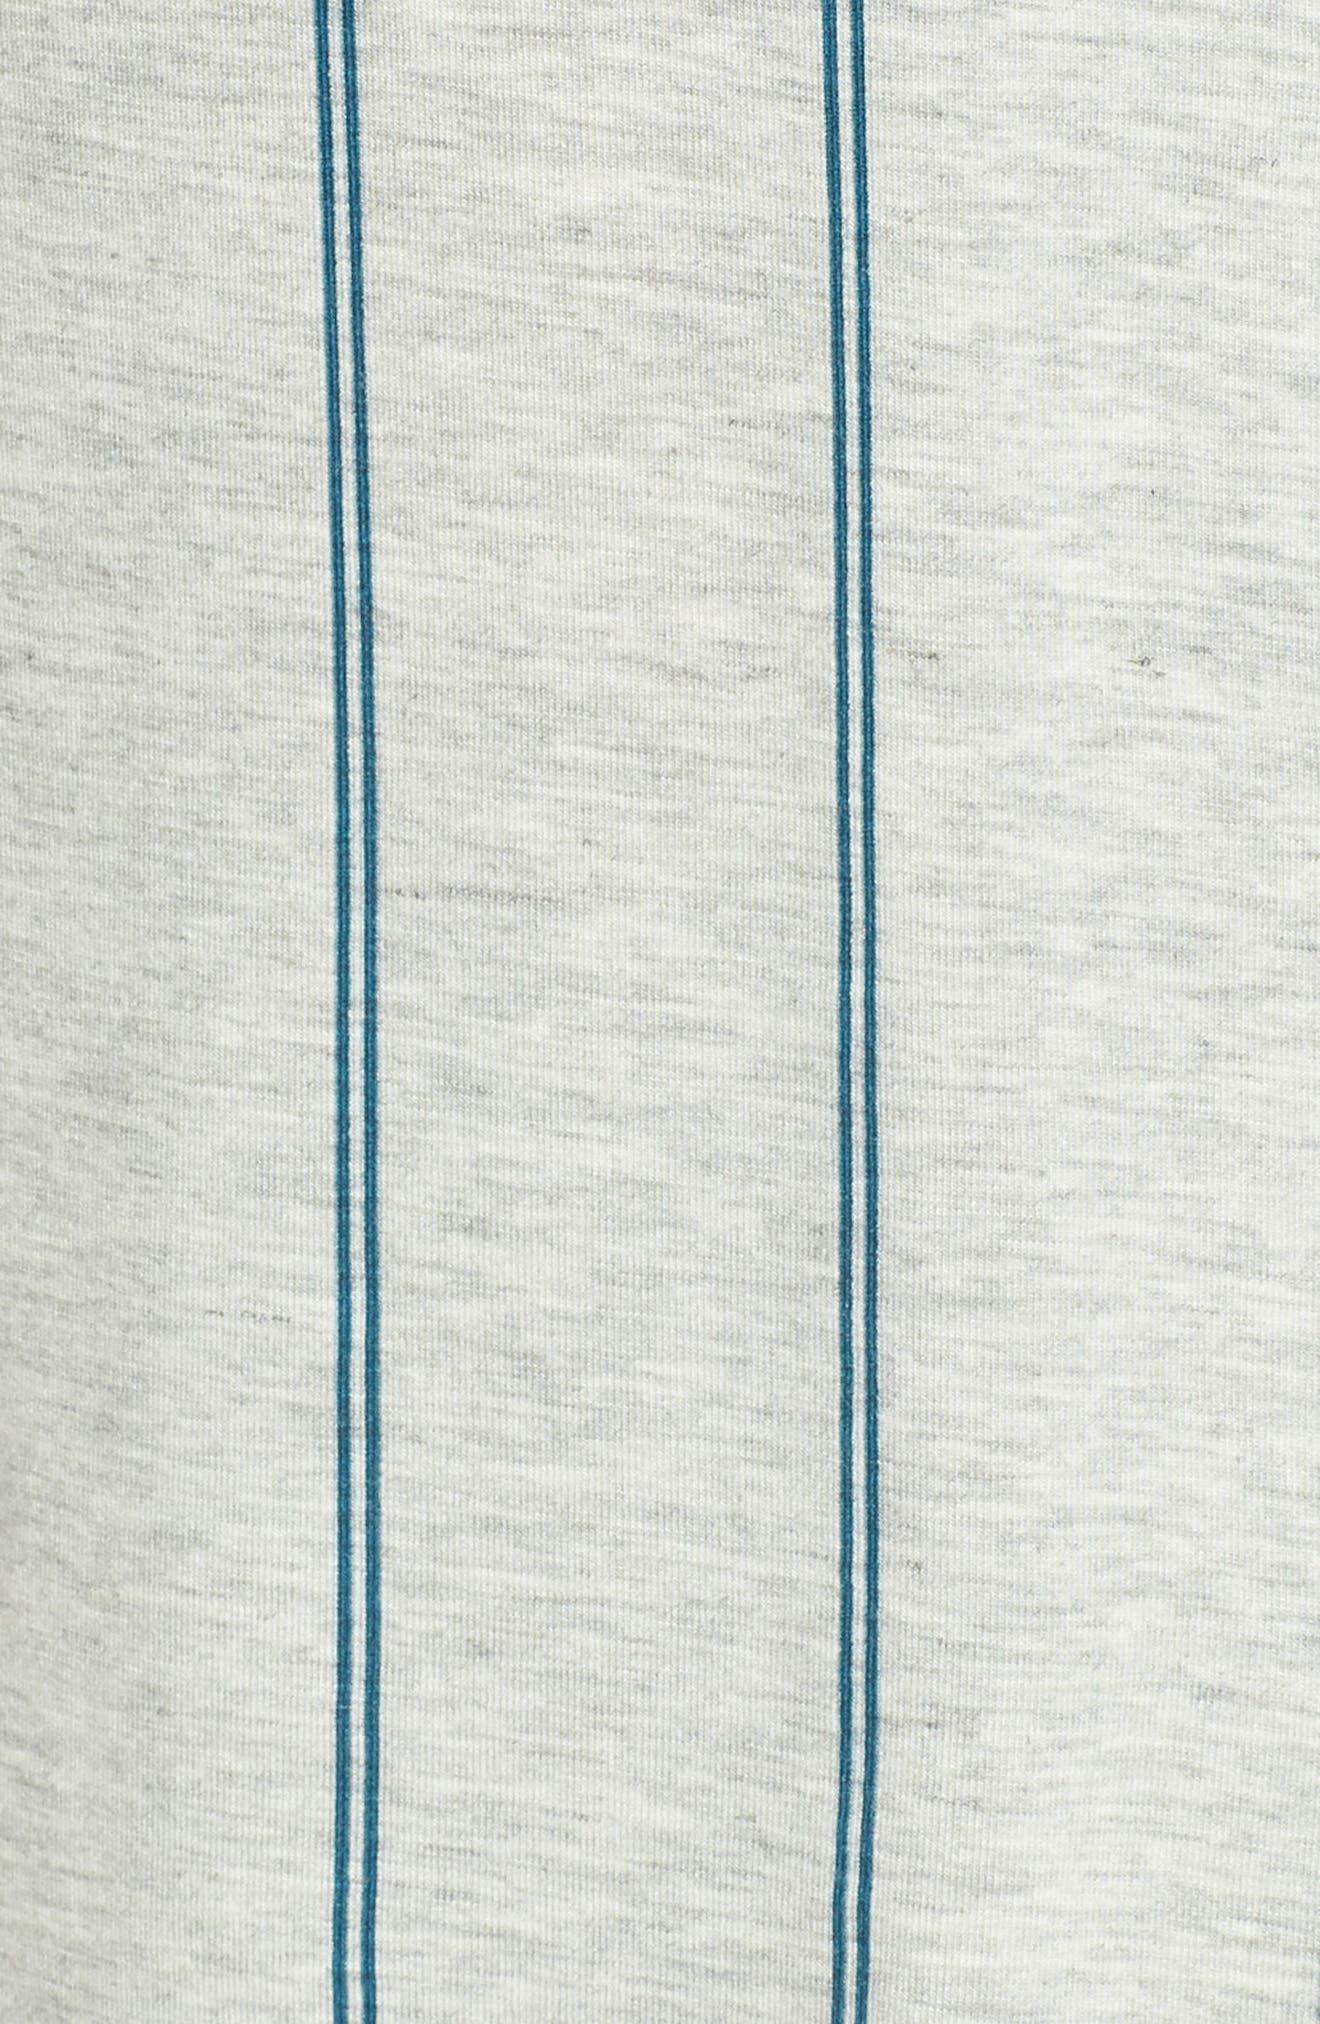 NORDSTROM LINGERIE, Moonlight Short Pajamas, Alternate thumbnail 5, color, GREY PEARL HTR MICRO STRIPE